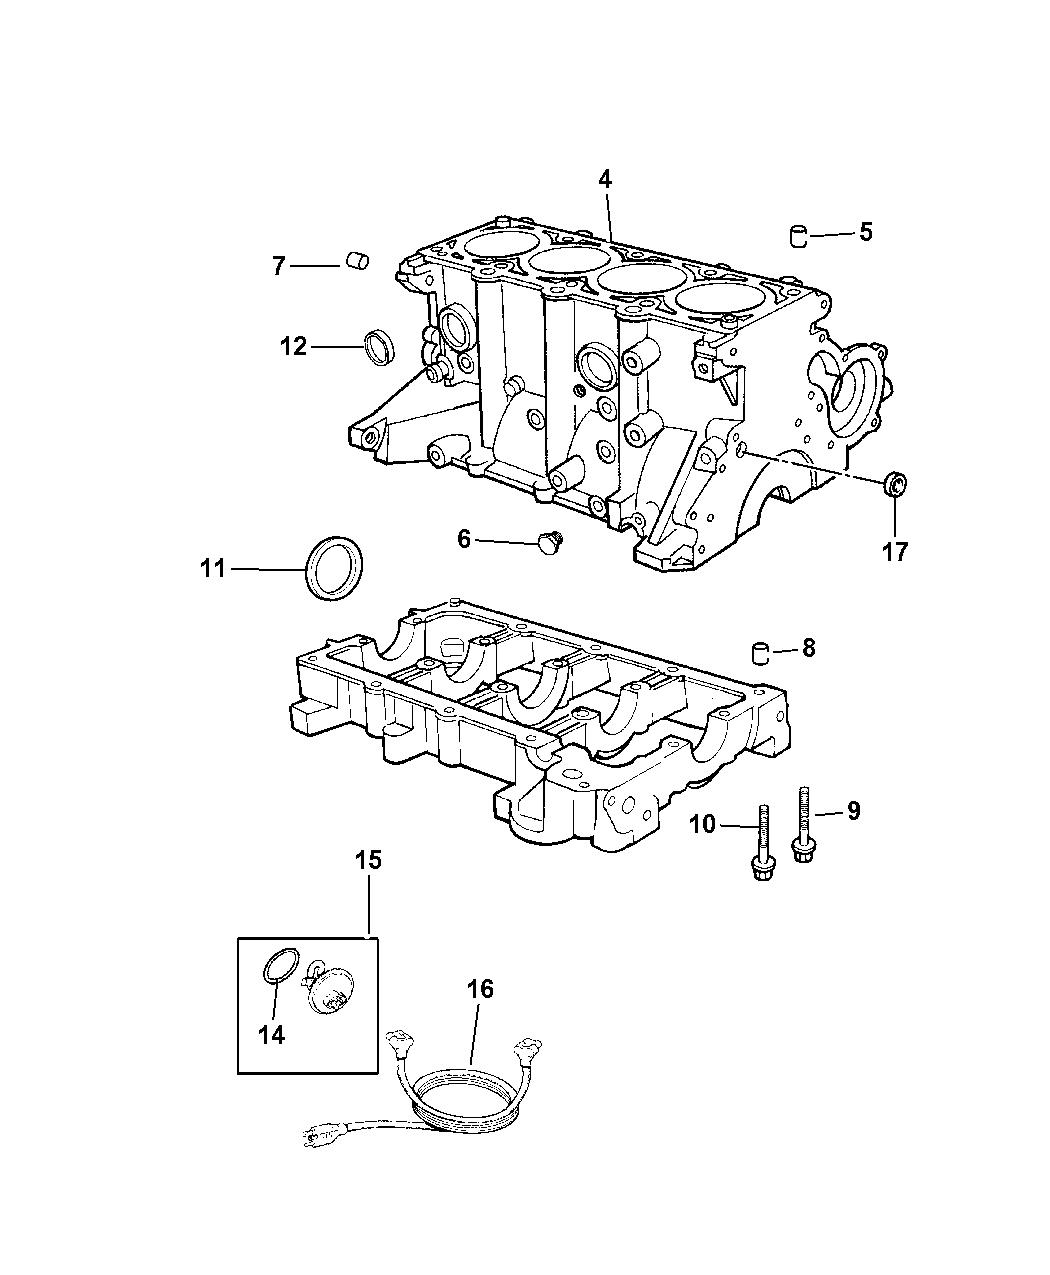 2004 Dodge Caravan Cylinder Block Mopar Parts Giant Engine Schematics Thumbnail 1